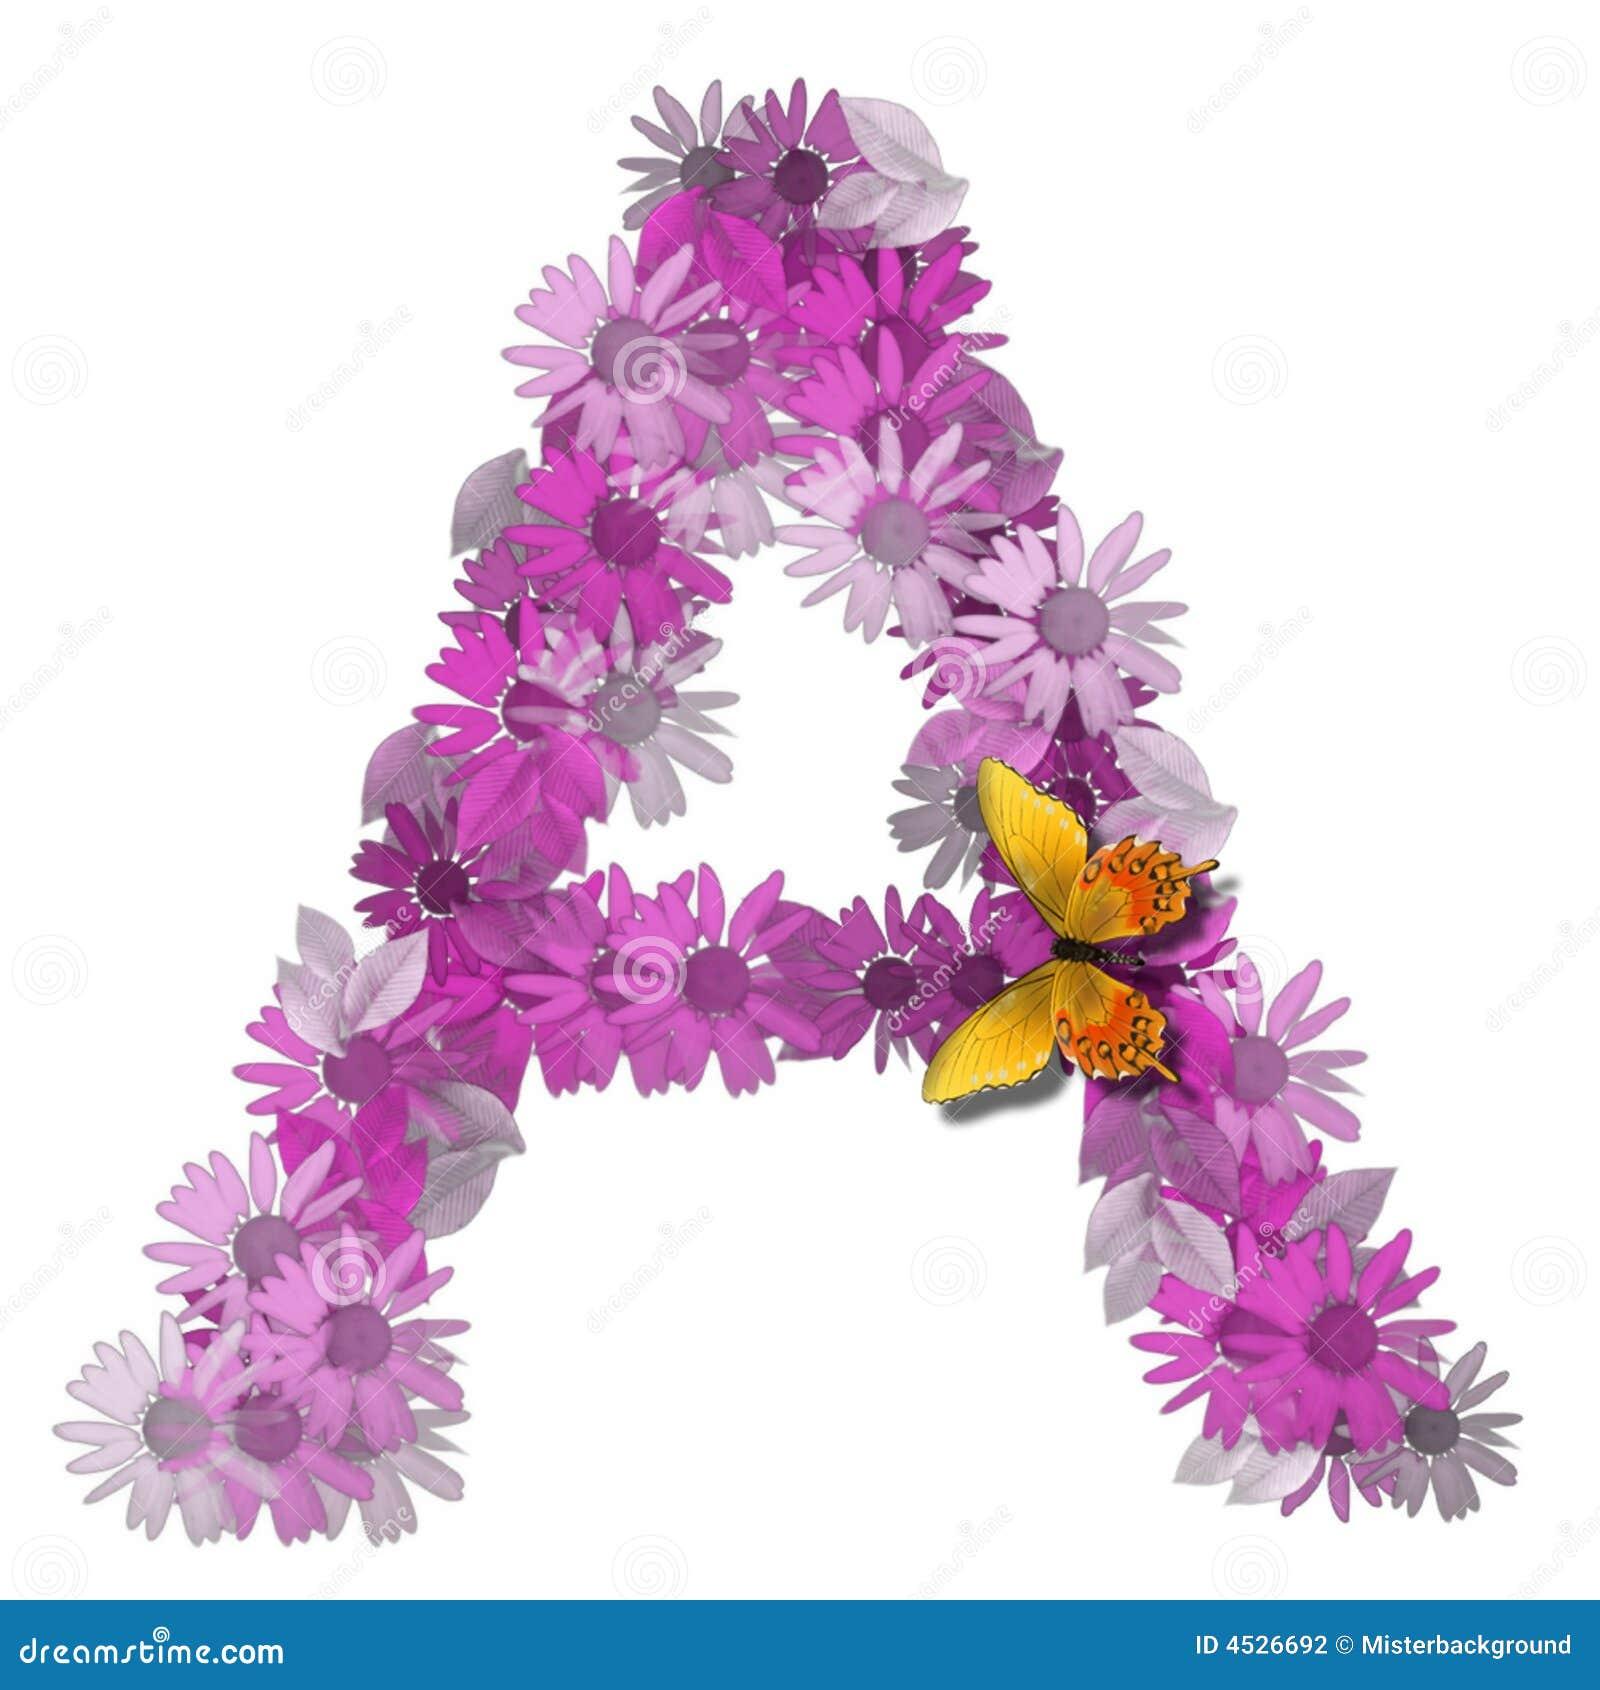 alphabetical letter consonant h stock photo image 4527260 alphabetical letter vowel a stock photography